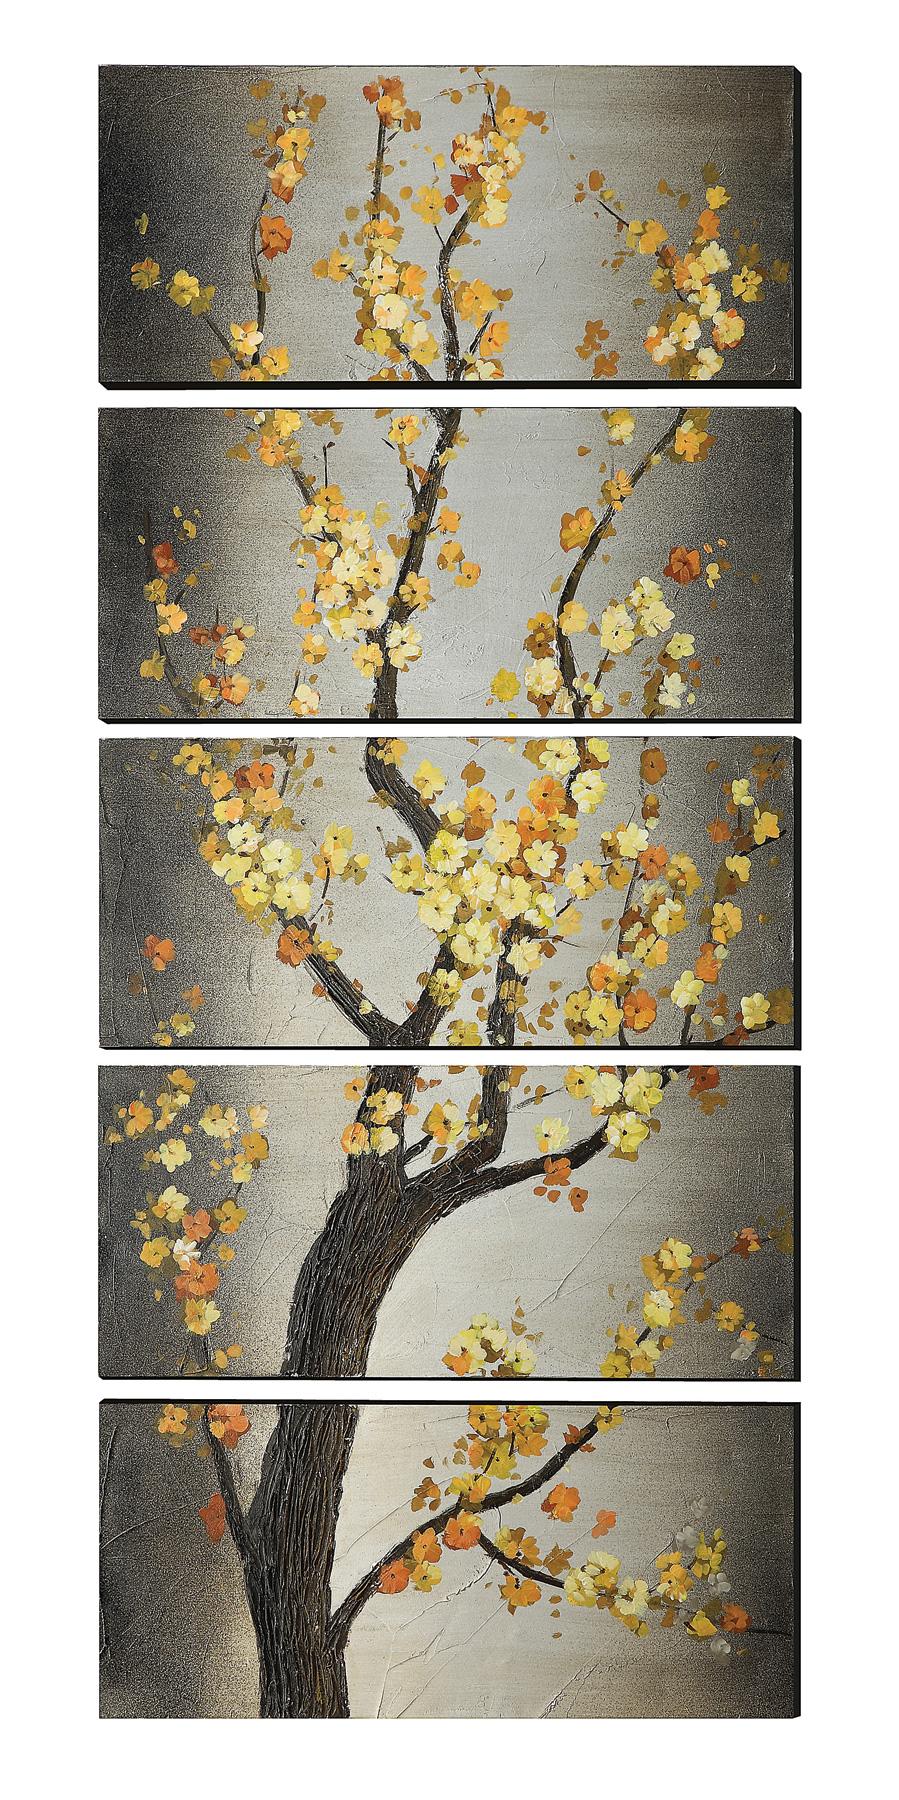 Coaster Wall Art Art - Item Number: 960729